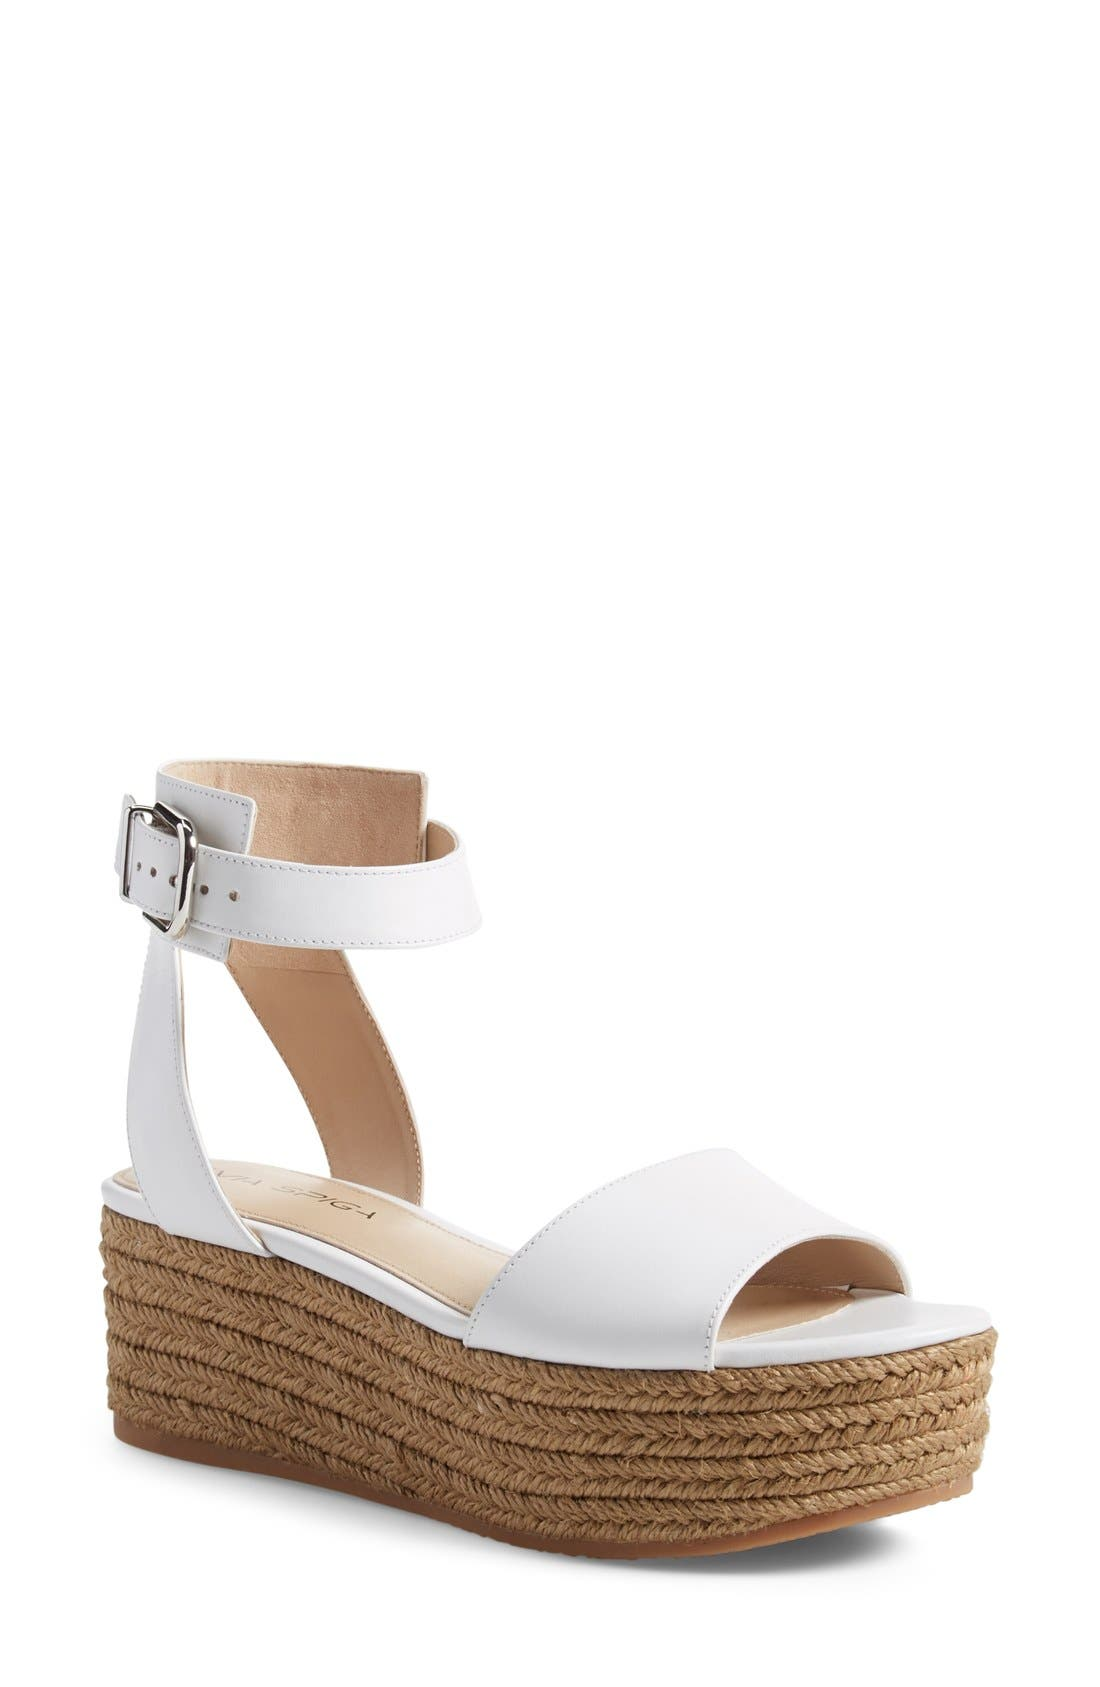 Alternate Image 1 Selected - Via Spiga 'Nemy' Platform Sandal (Women)